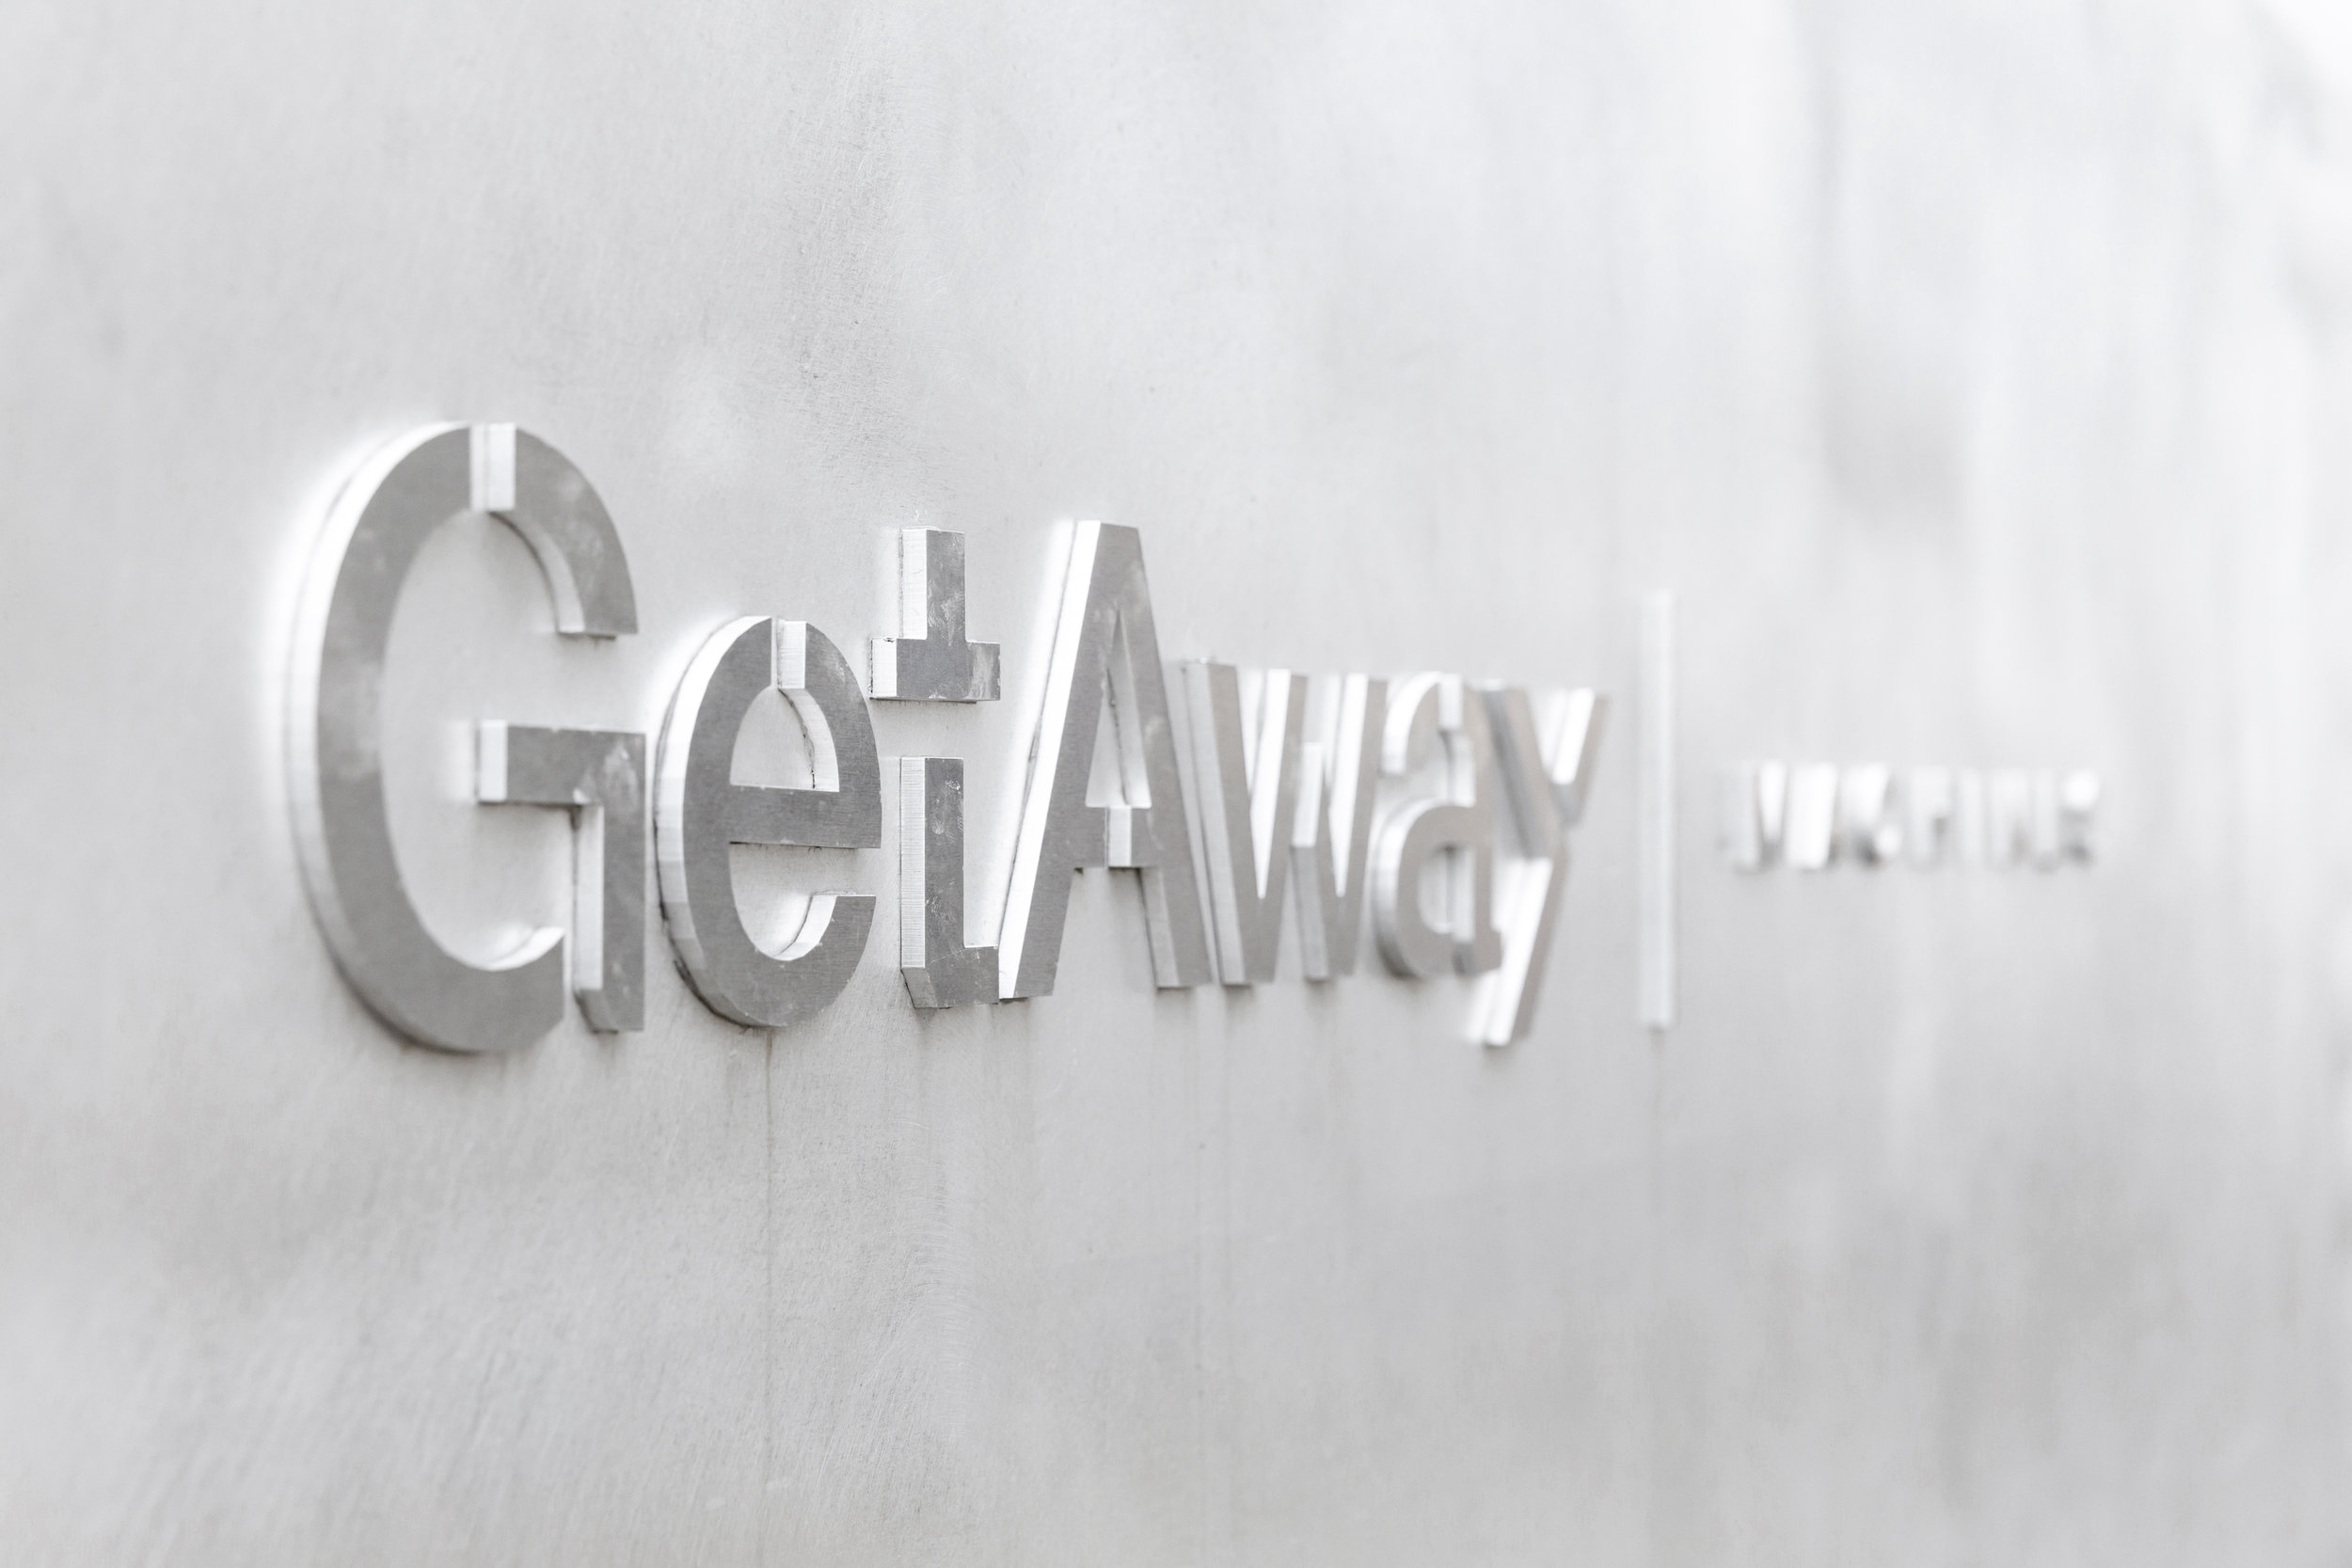 Getawaymachine 056_small.jpg